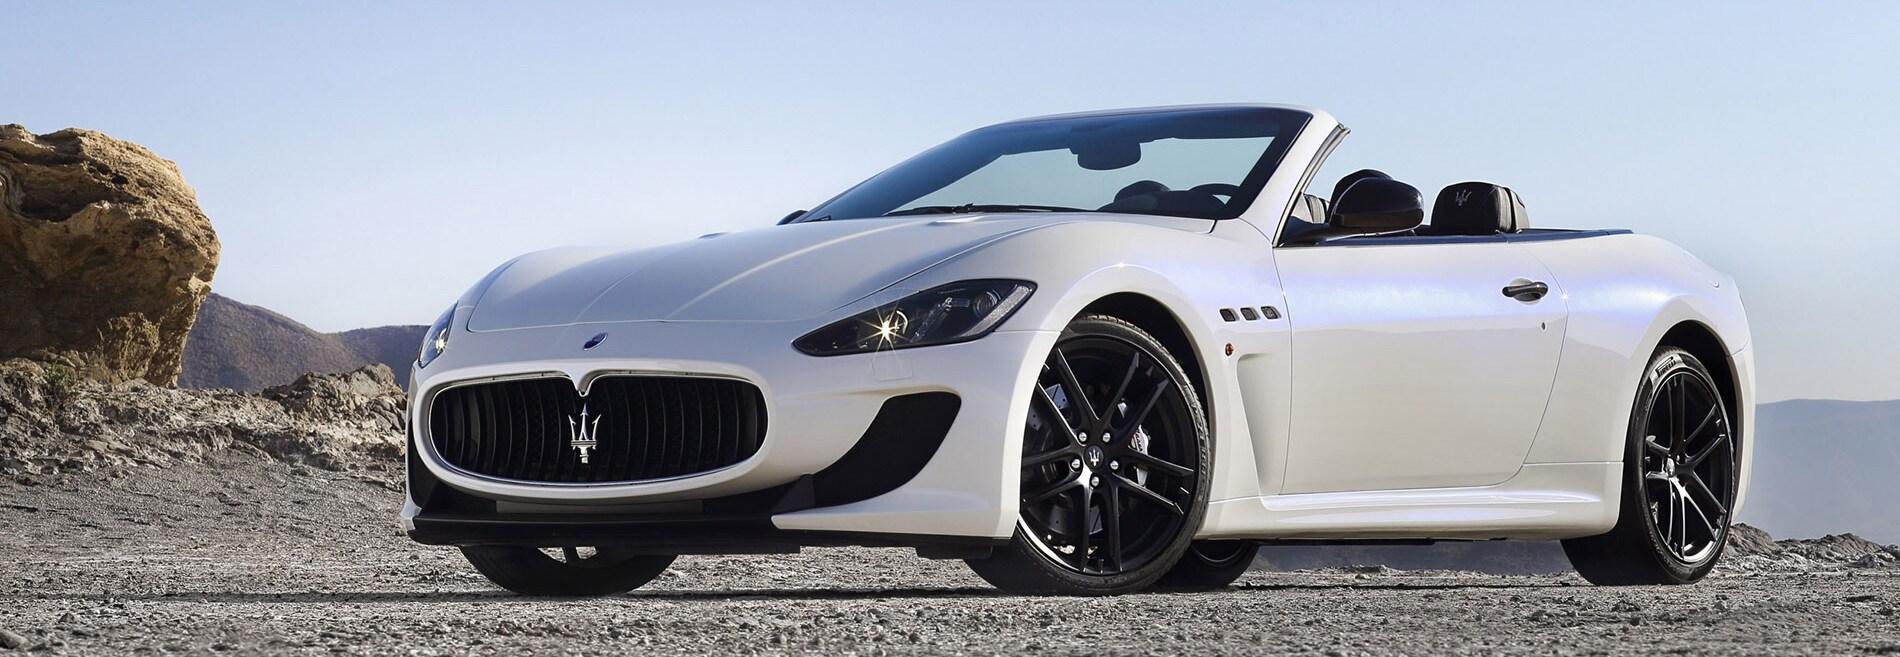 Maserati Service & Repair, Oil Change, Tires Sugar Land TX, Houston